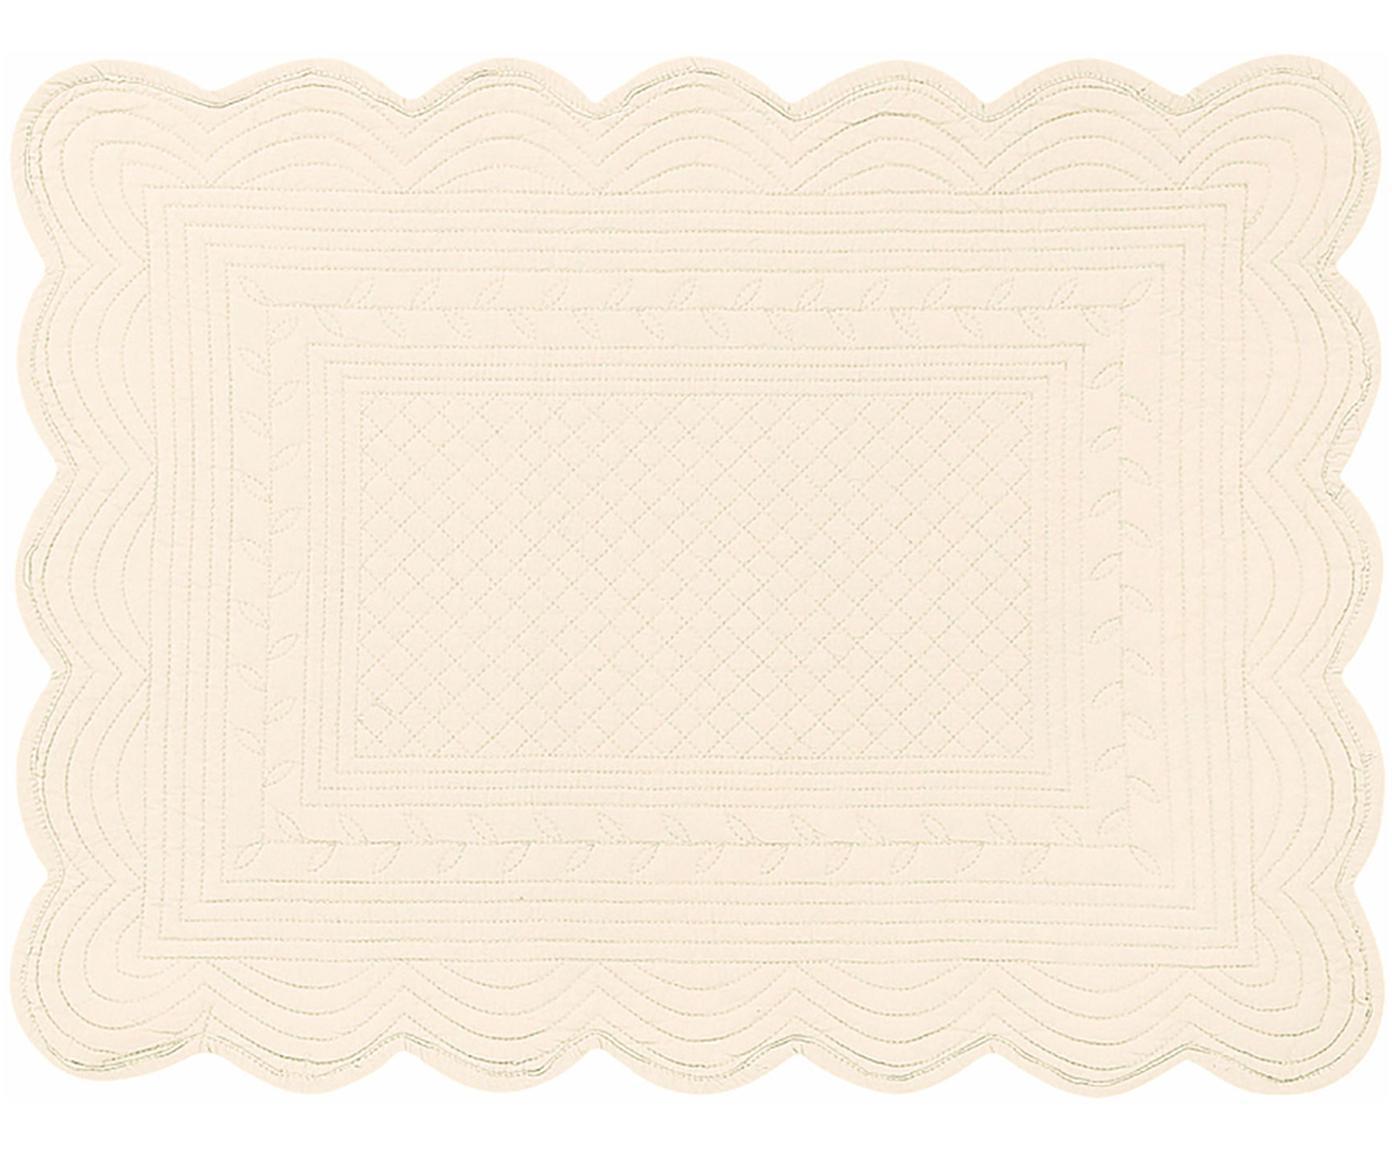 Manteles individuales Boutis, 6uds., Algodón, Marfil, An 34 x L 48 cm